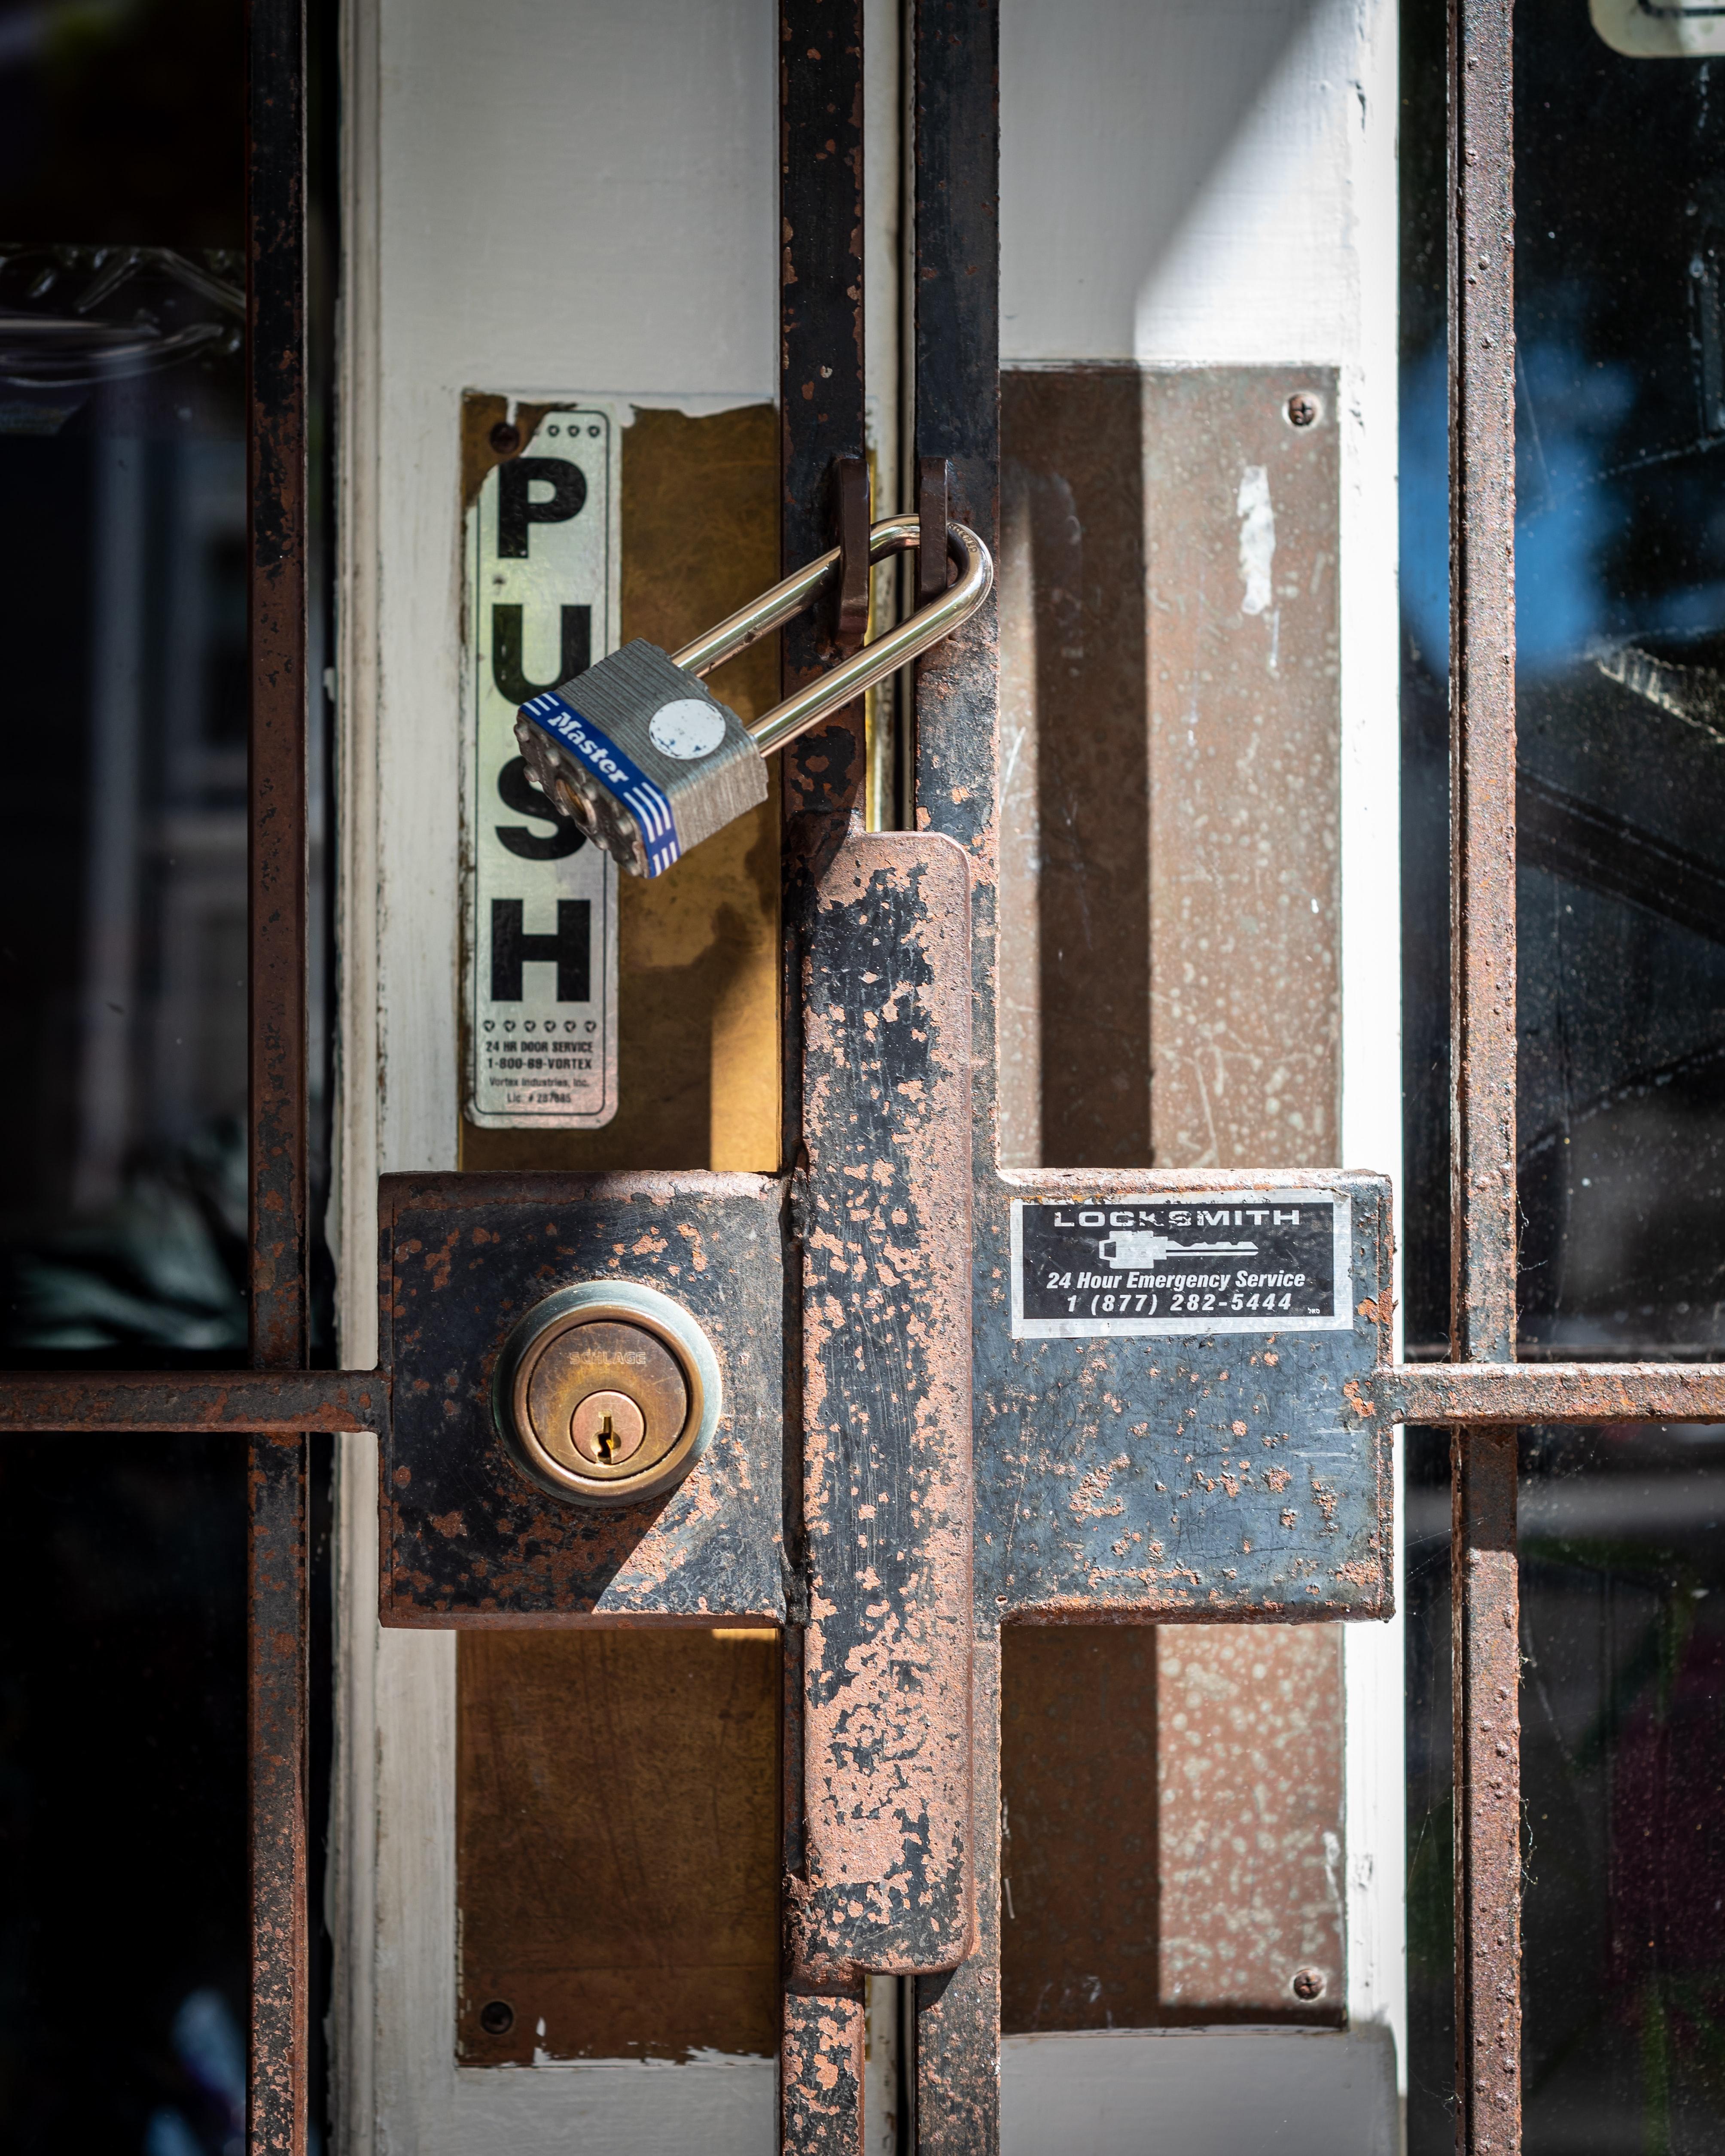 Picture of locks on an old rusty metal door